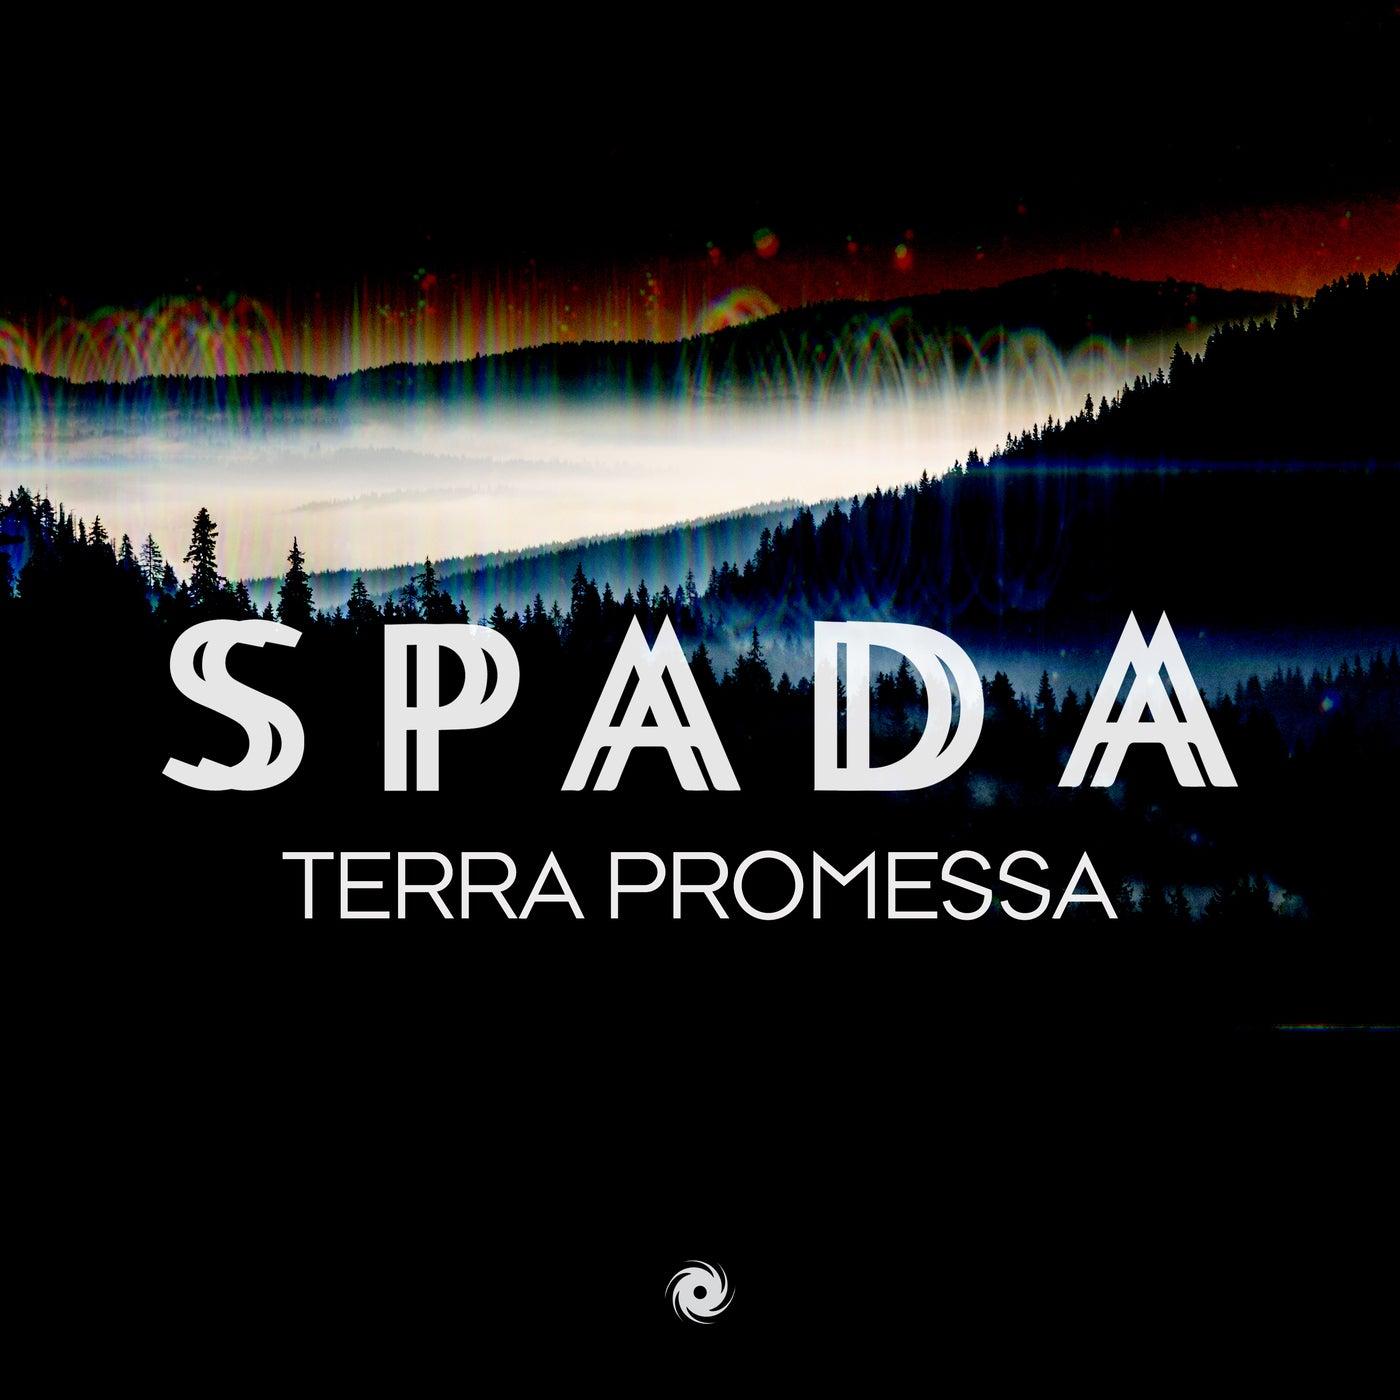 Terra Promessa (Extended Mix)